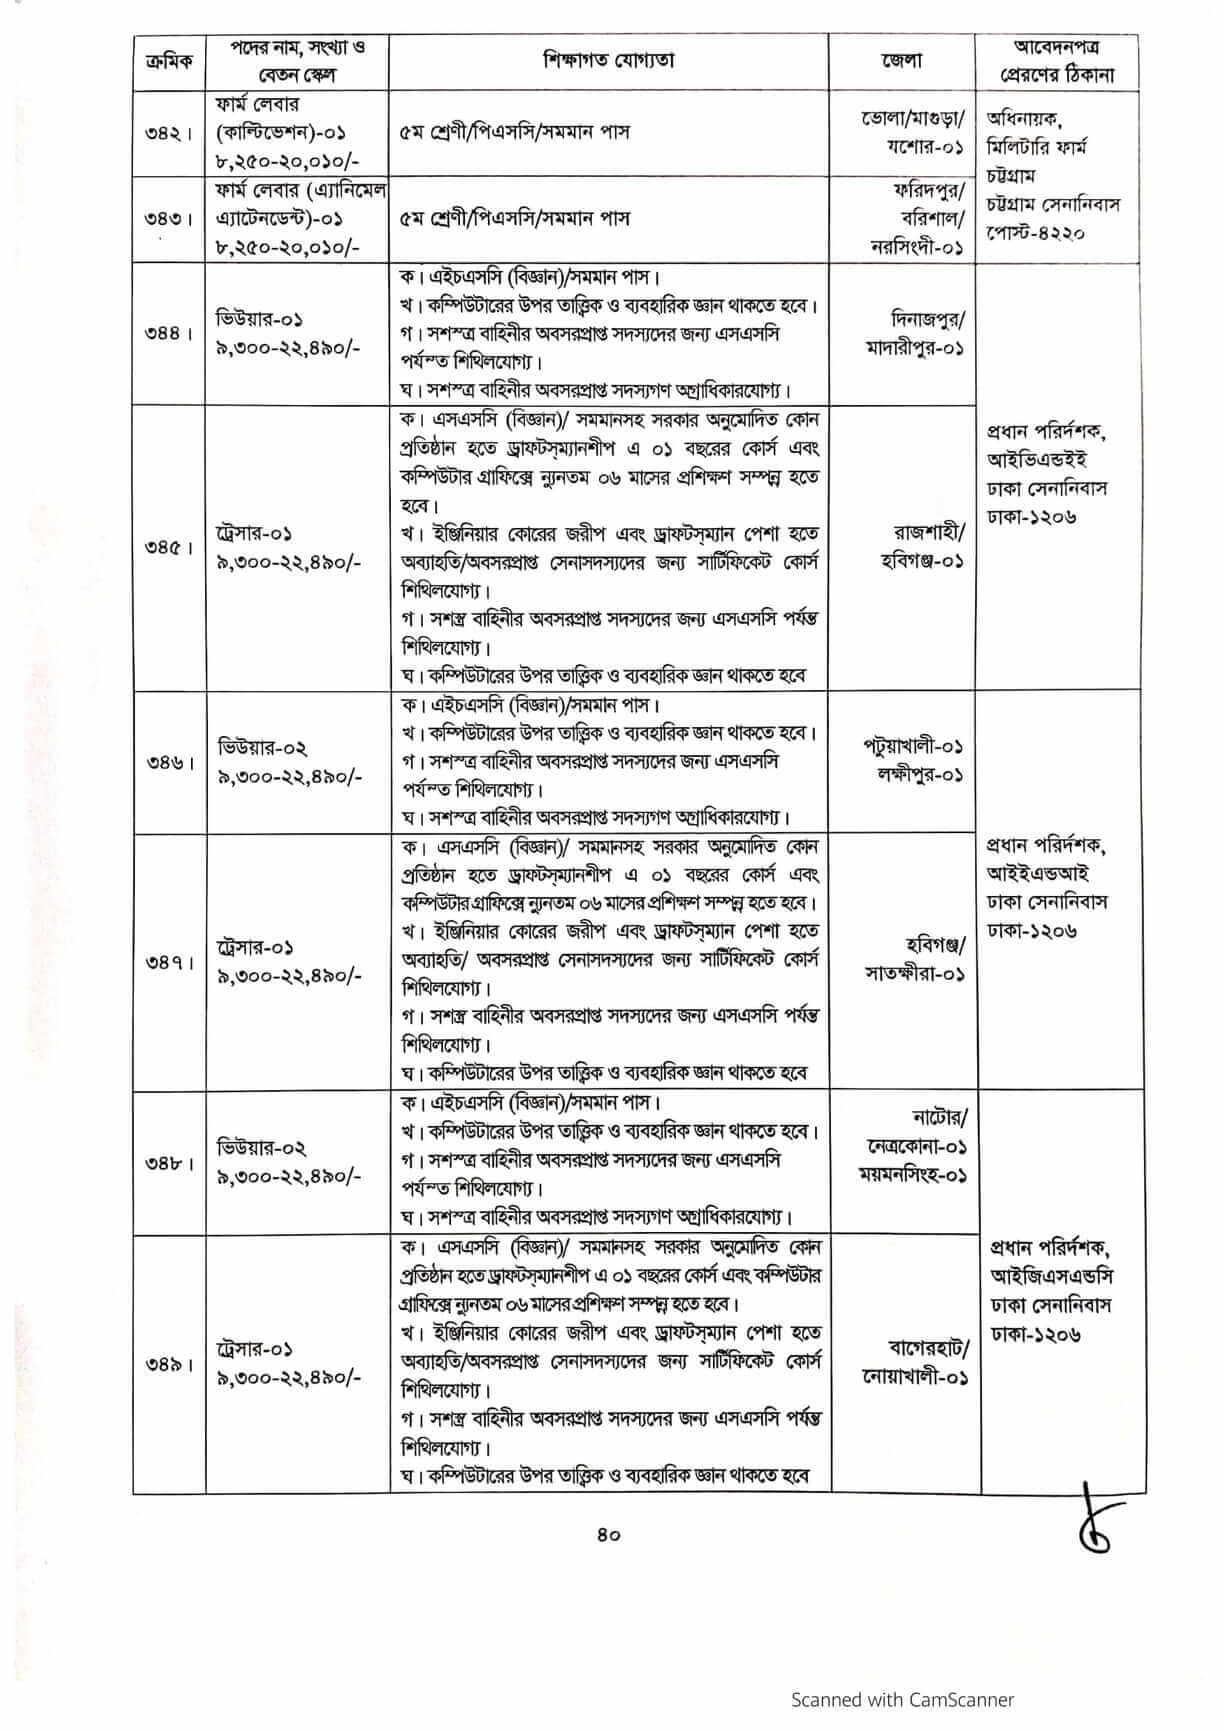 Bangladesh Army Job Circular PDF